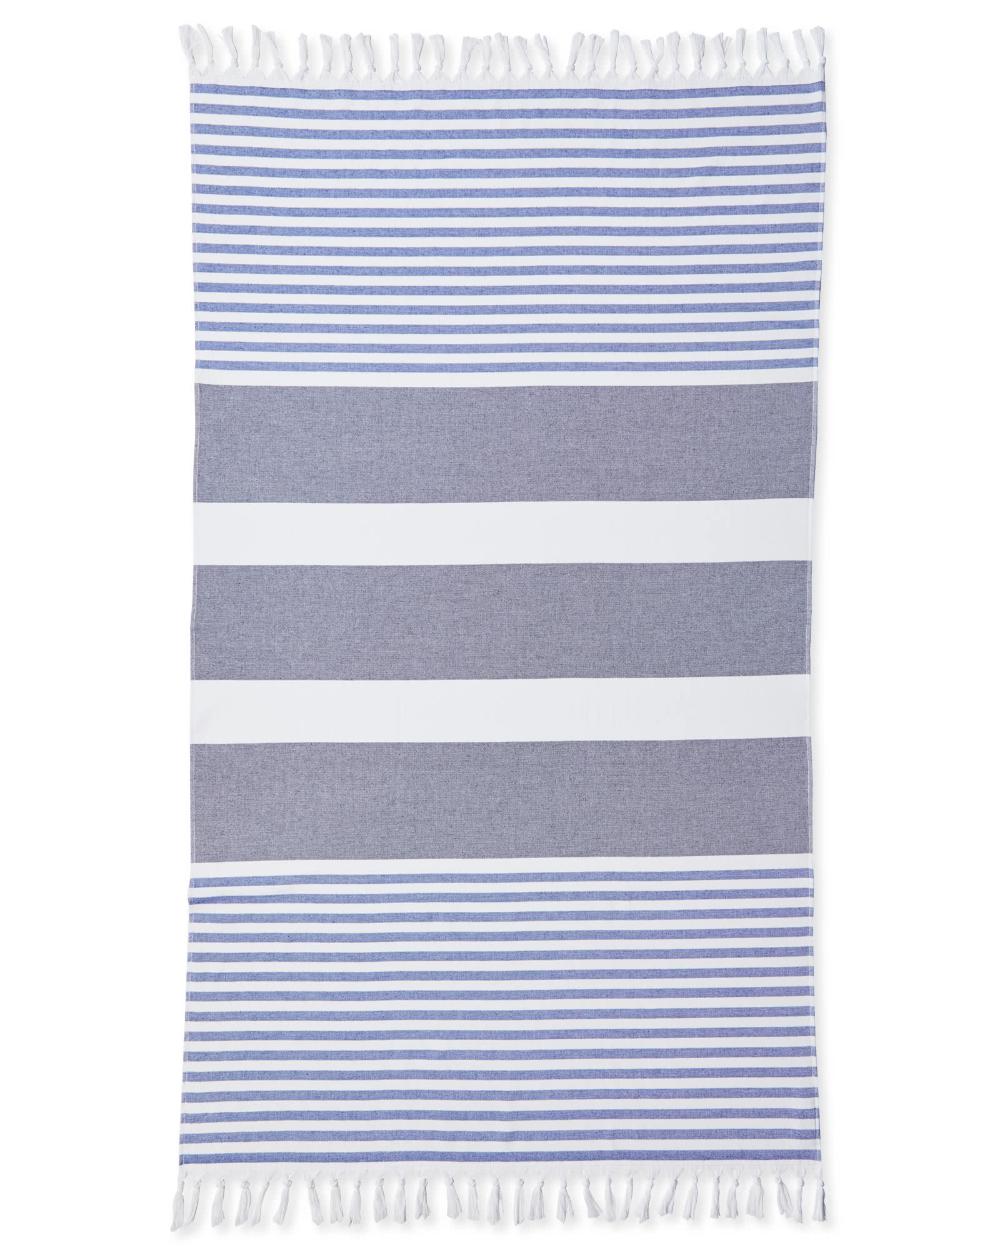 Capri Fouta Beach Towel Beach Towel Towel Towel Pattern